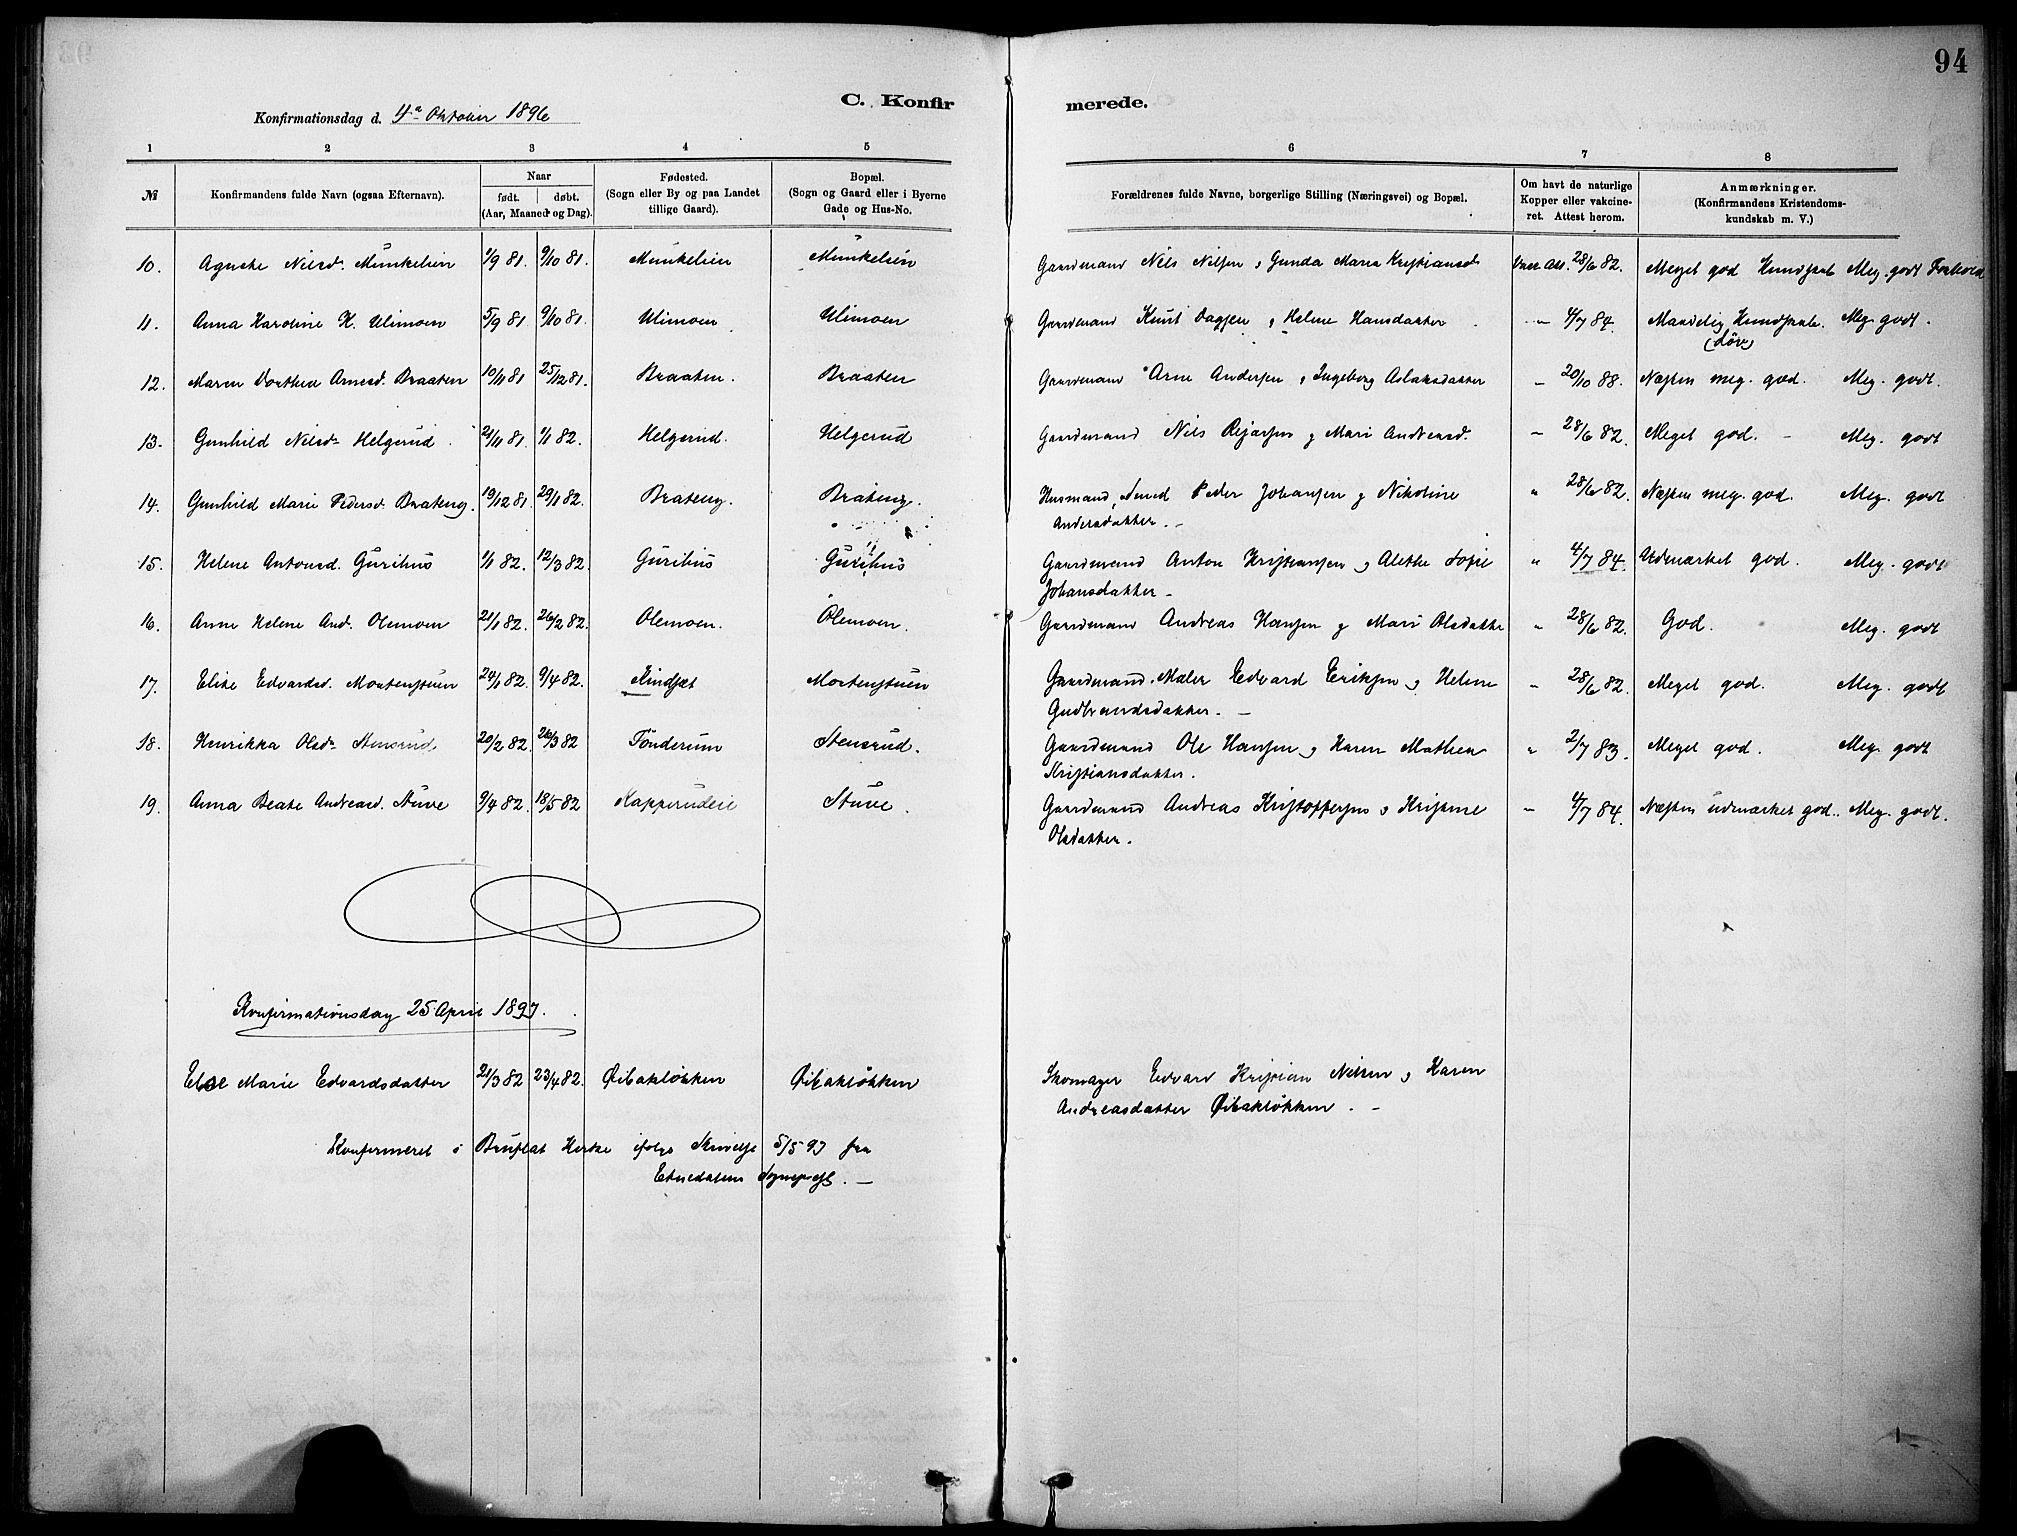 SAH, Nordre Land prestekontor, Ministerialbok nr. 5, 1882-1903, s. 94